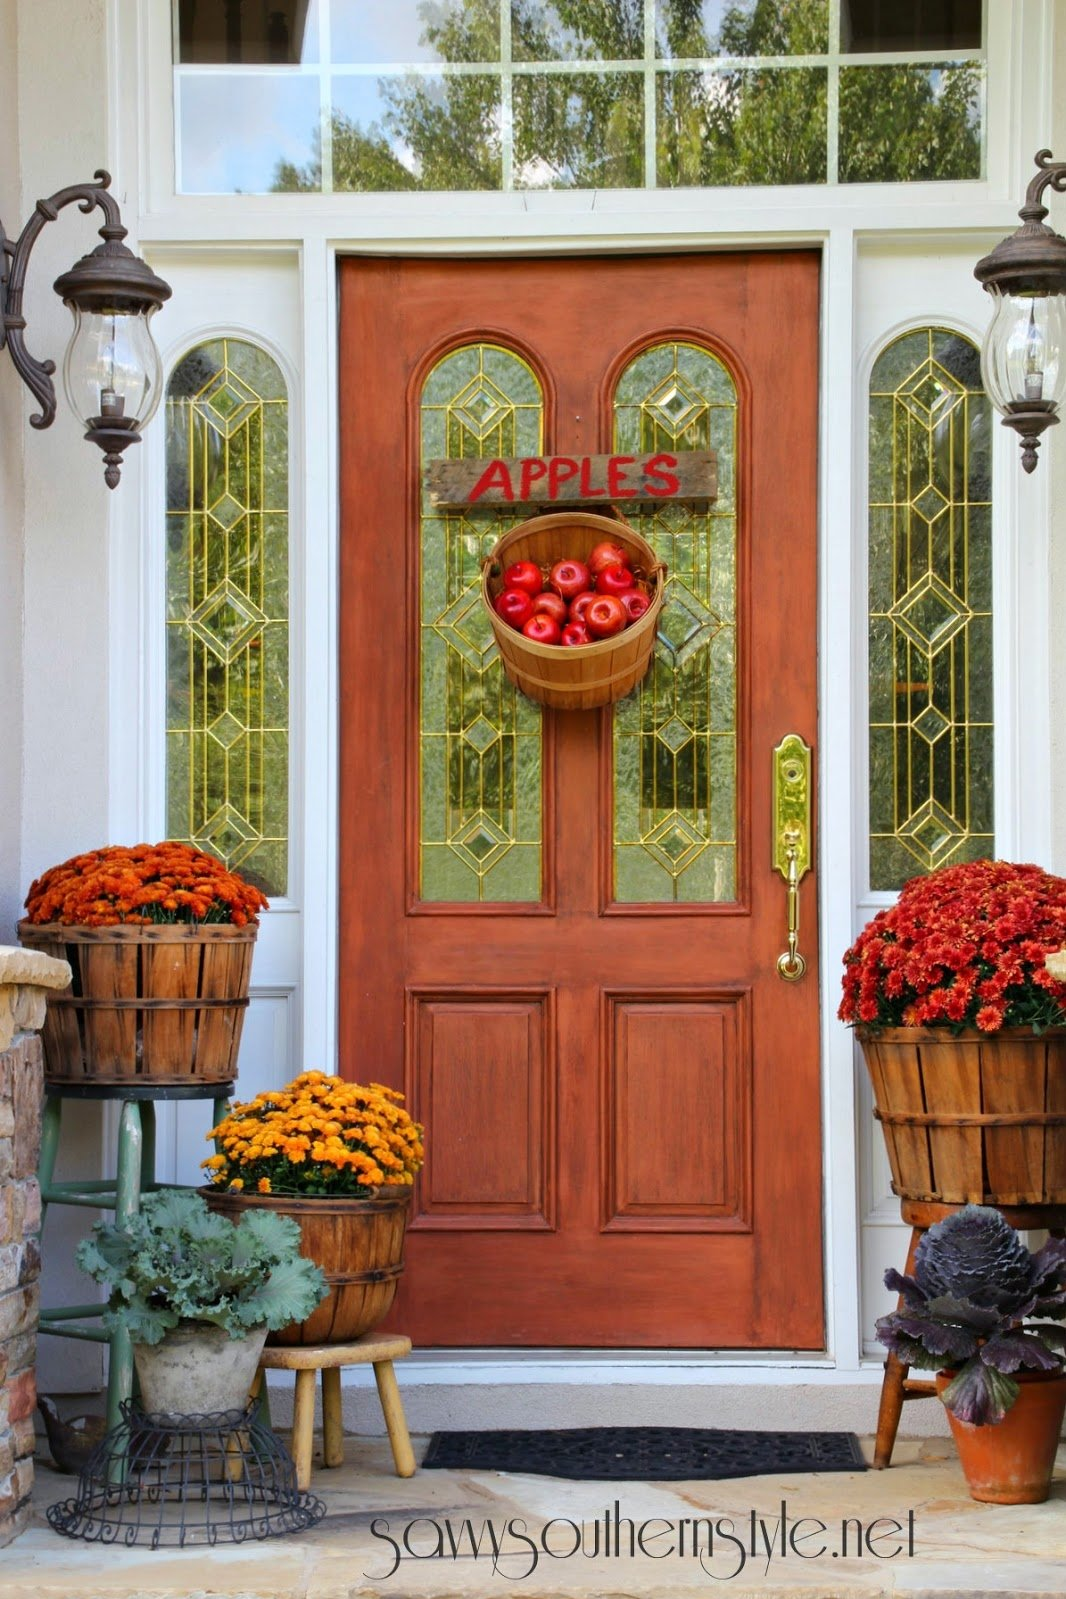 10 Cute Fall Front Porch Decorating Ideas 37 fall porch decorating ideas ways to decorate your porch for fall 2 2020